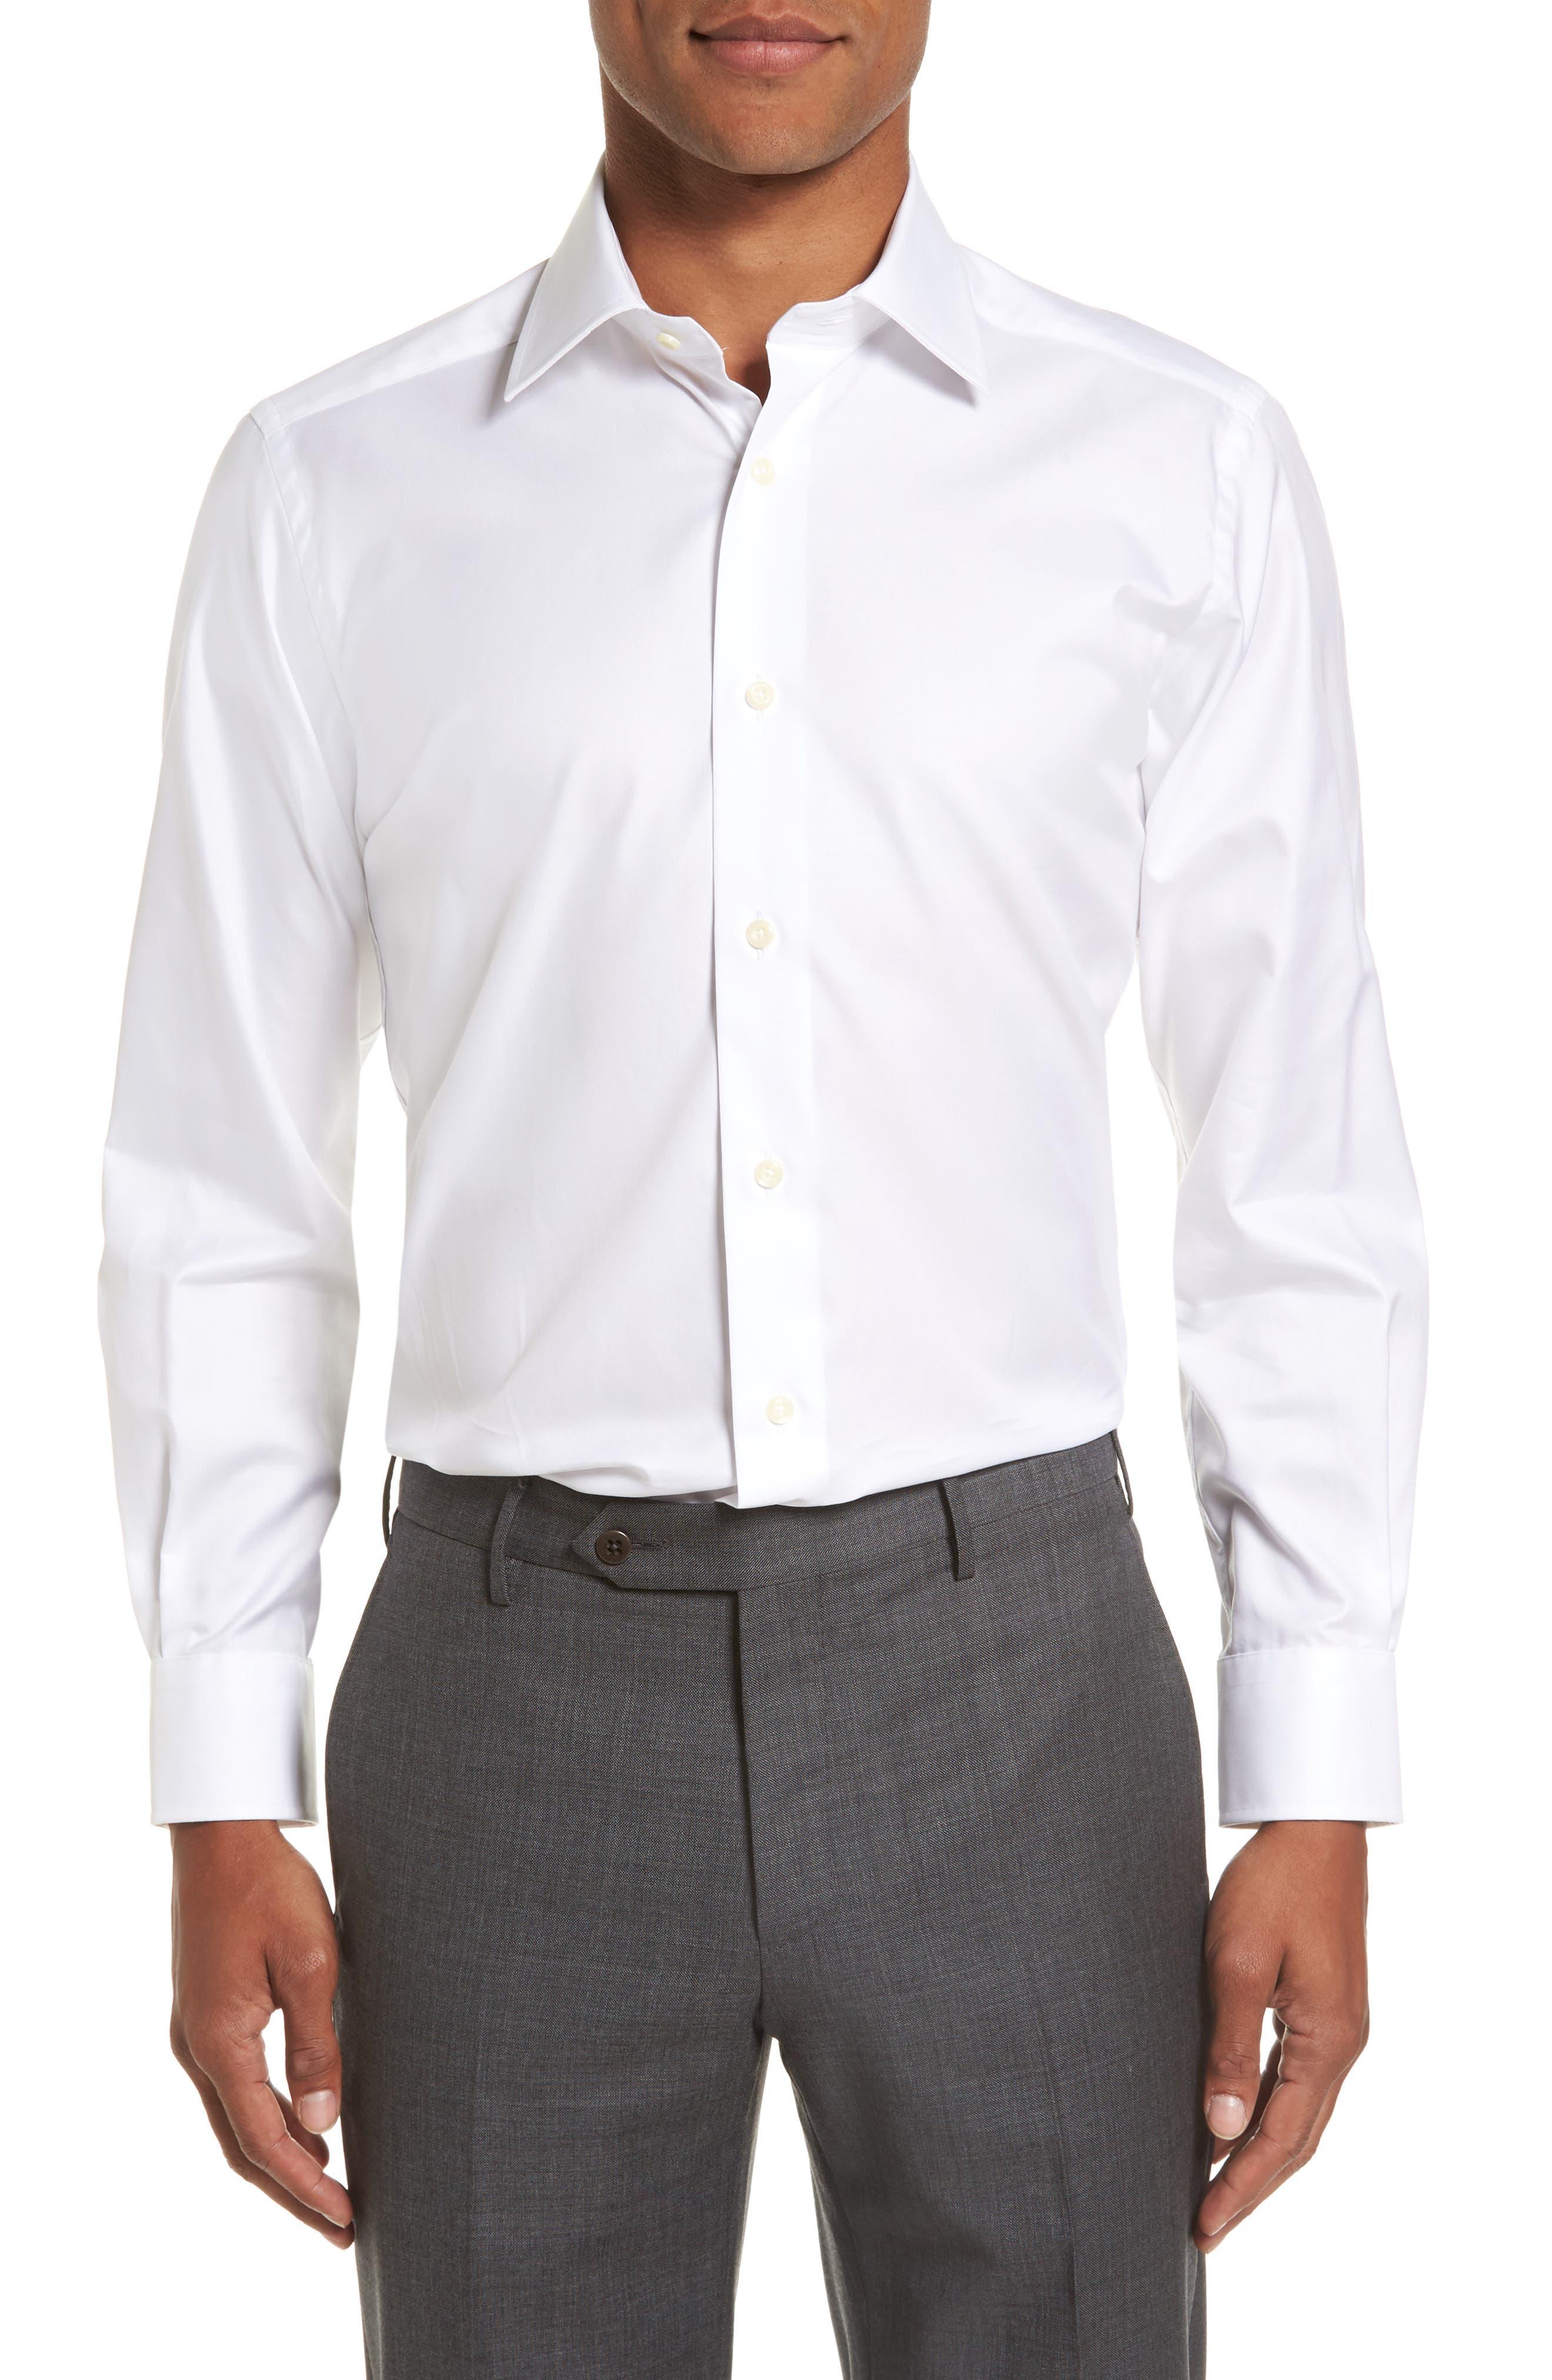 Alternate Image 2  - David Donahue Trim Fit Solid Dress Shirt